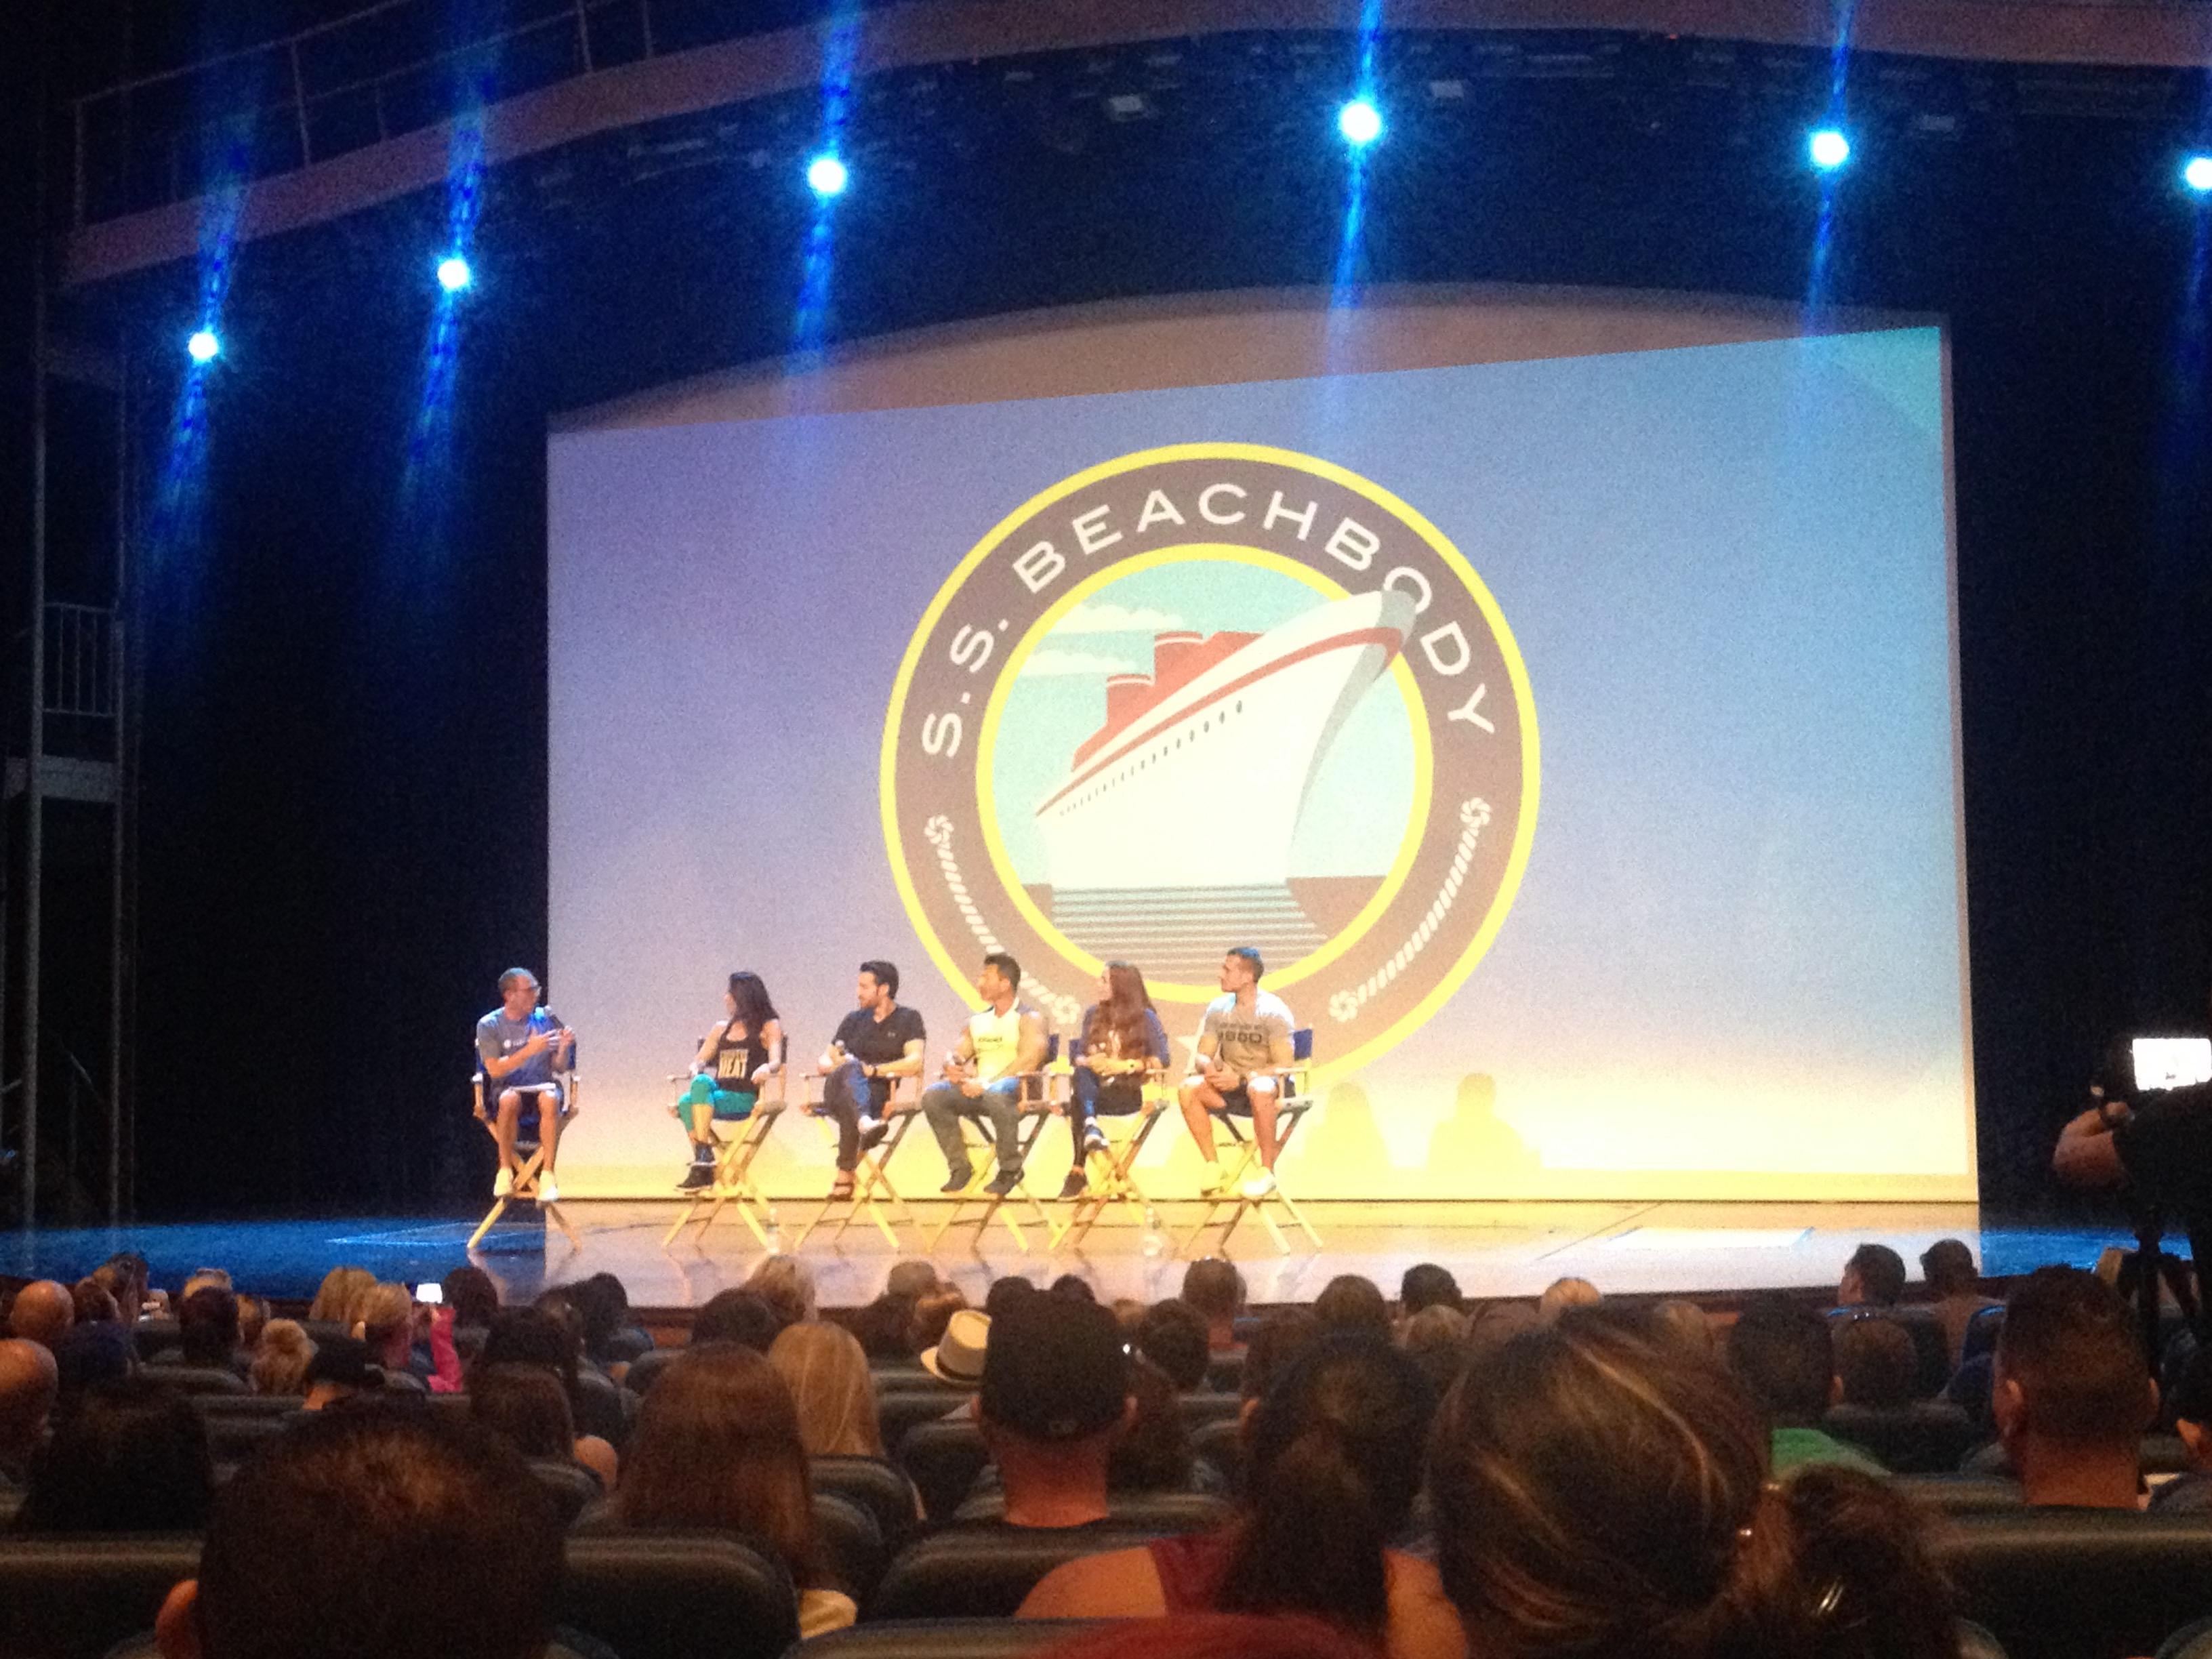 Beachbody Celebrity Trainer Panel